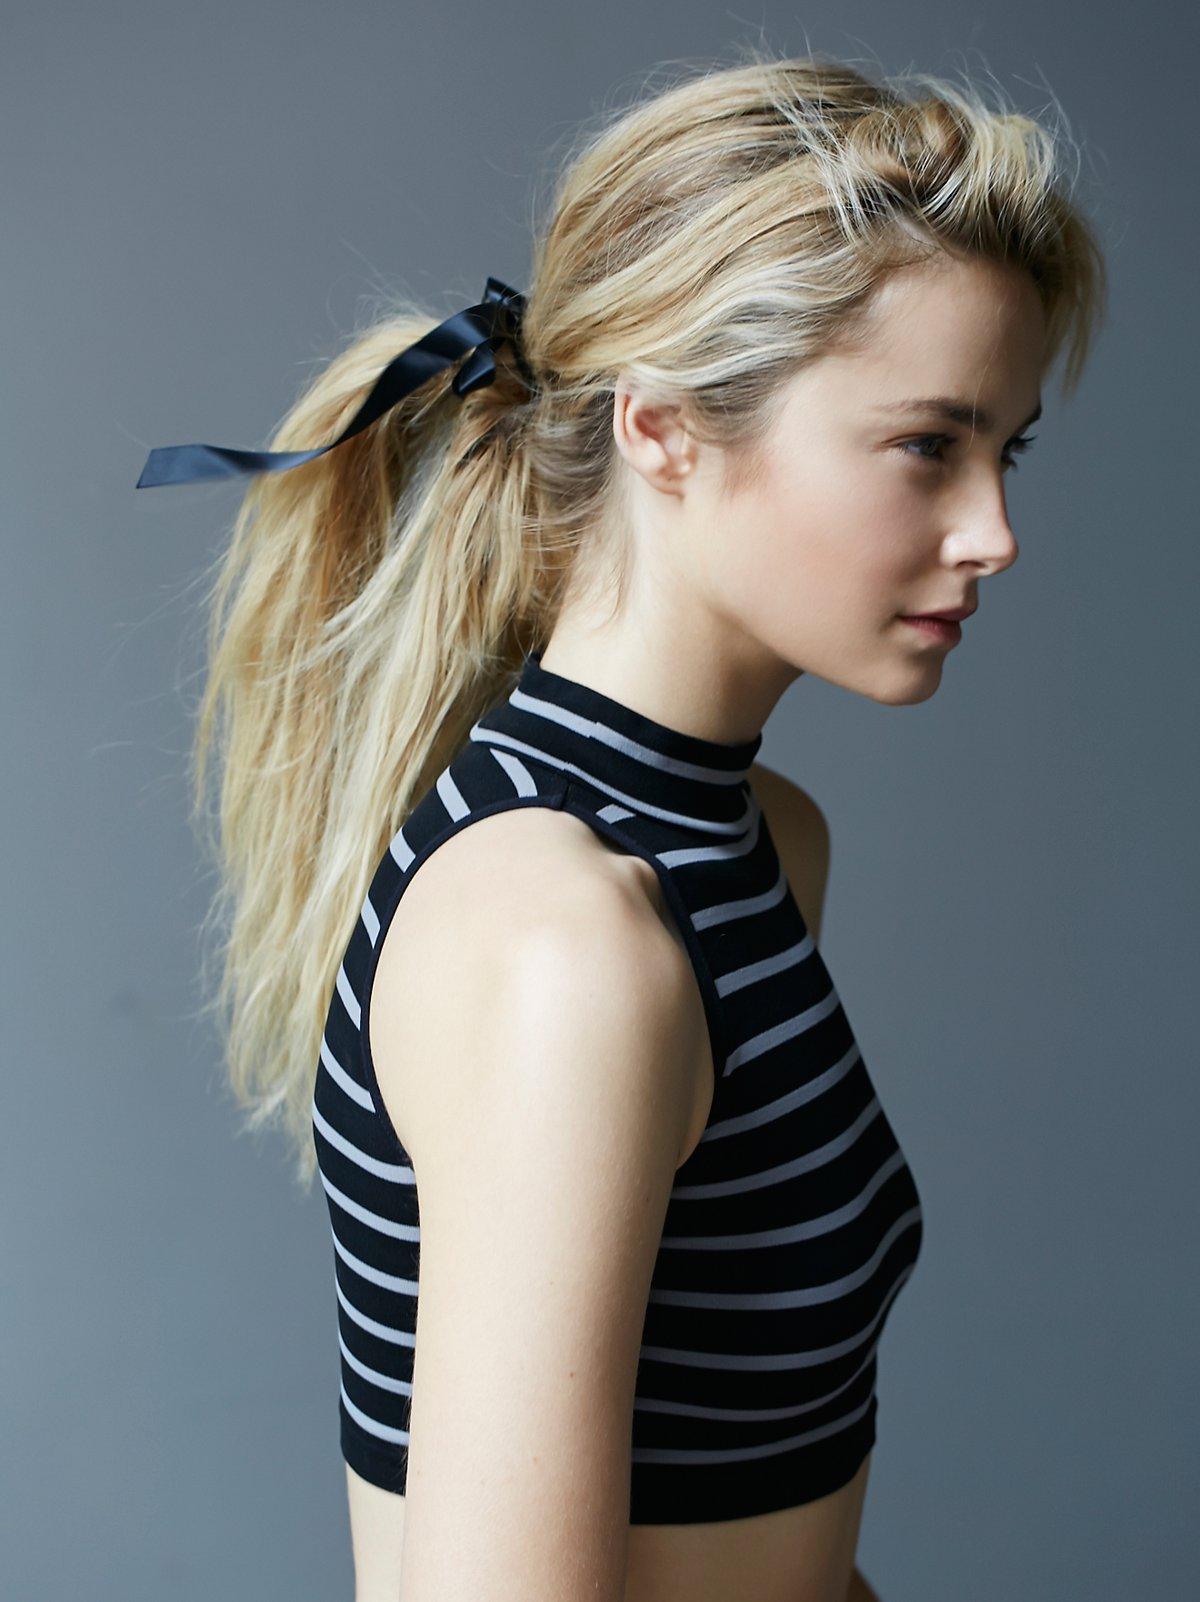 Chloe缎带松紧发带